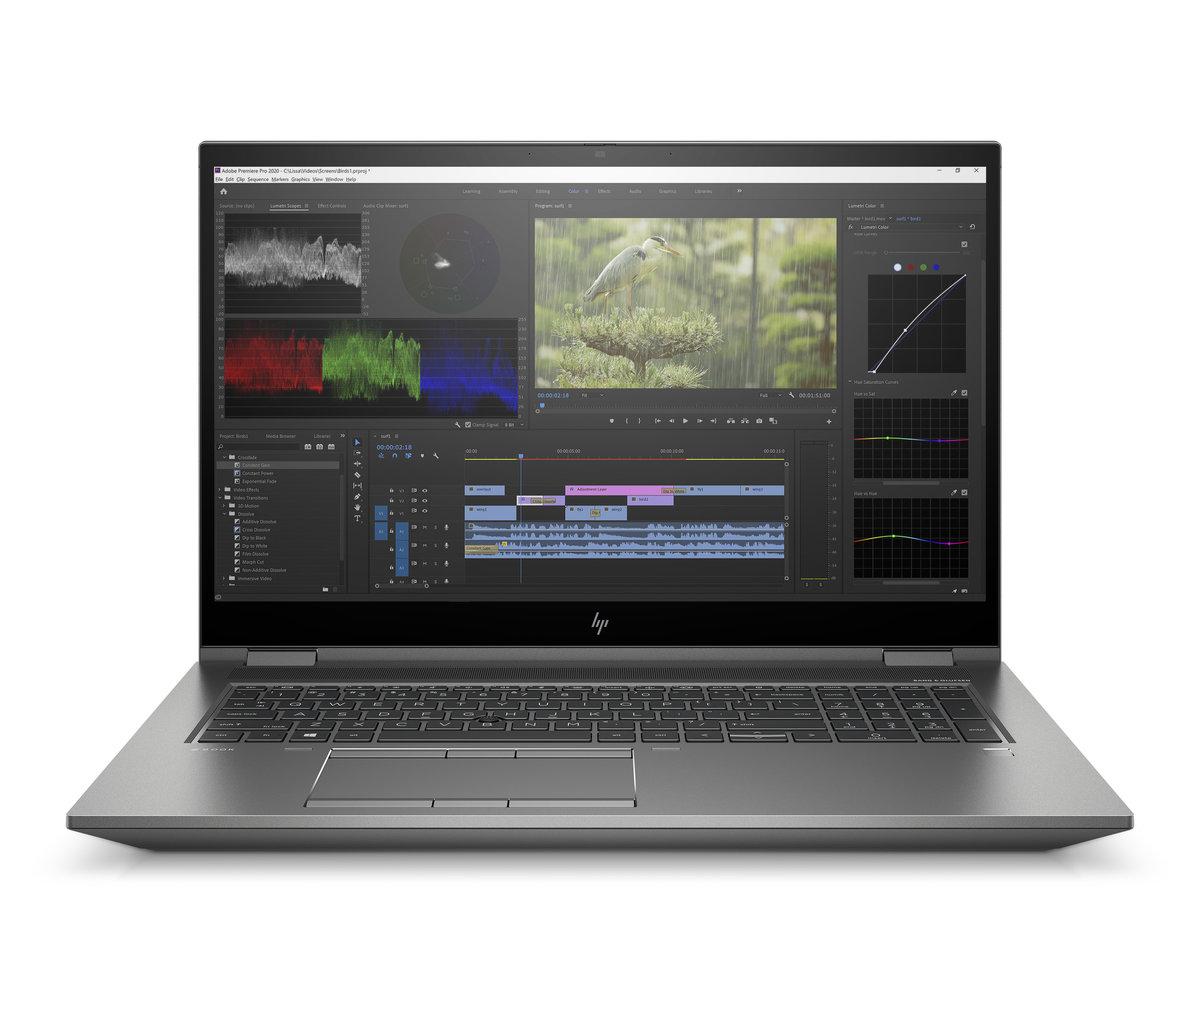 HP ZBook 17 Fury G8 17,3'' 300nts i7-11800H/16GB/512M.2 NVMe/Nvidia Quadro RTX T1200-4GB/W10P/3y - 4A698EA#BCM